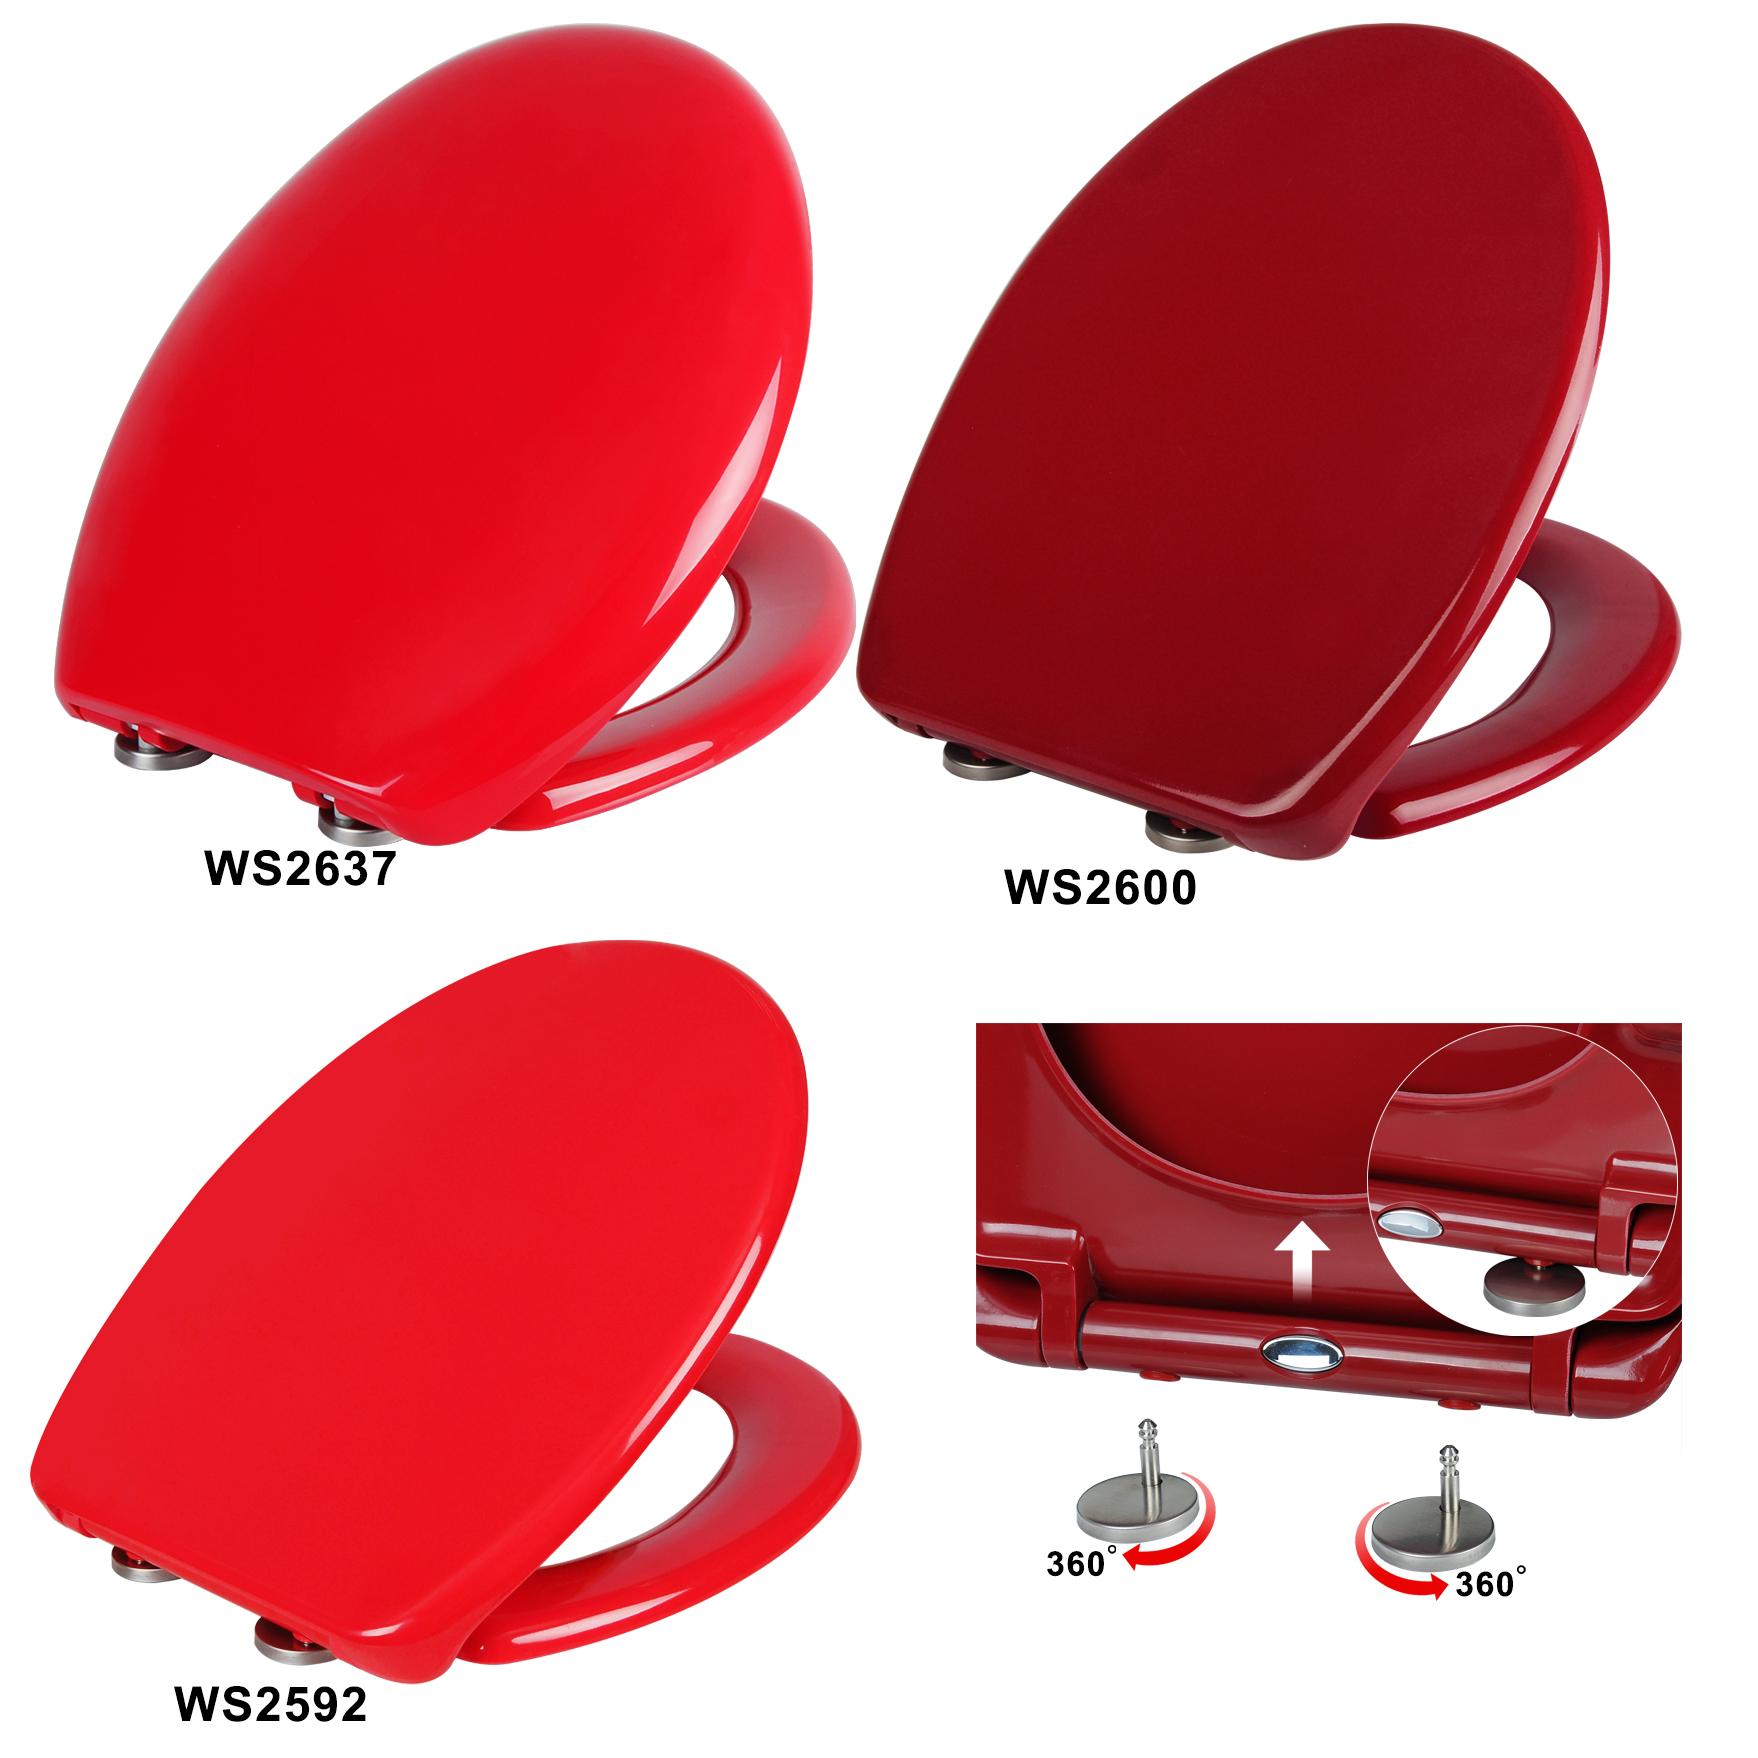 wc sitz toilettensitz deckel absenkautomatik toilettendeckel klositz rot 122 1 ebay. Black Bedroom Furniture Sets. Home Design Ideas